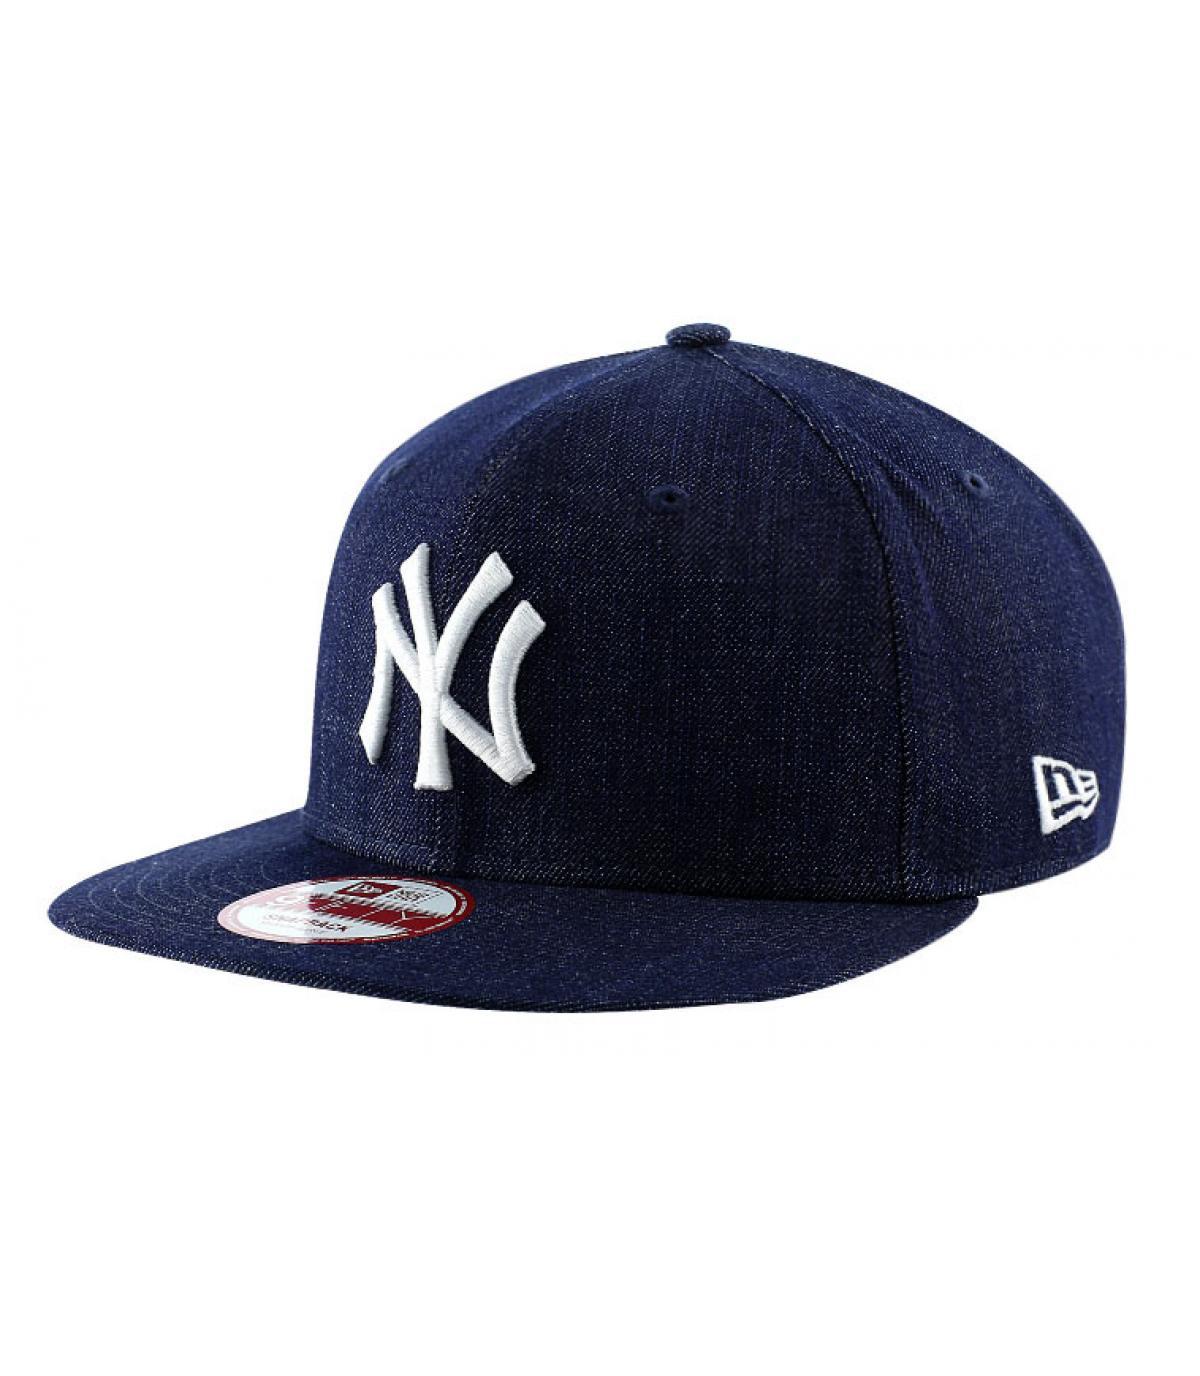 Details Snapback Cap NY MLB denim basic - Abbildung 2